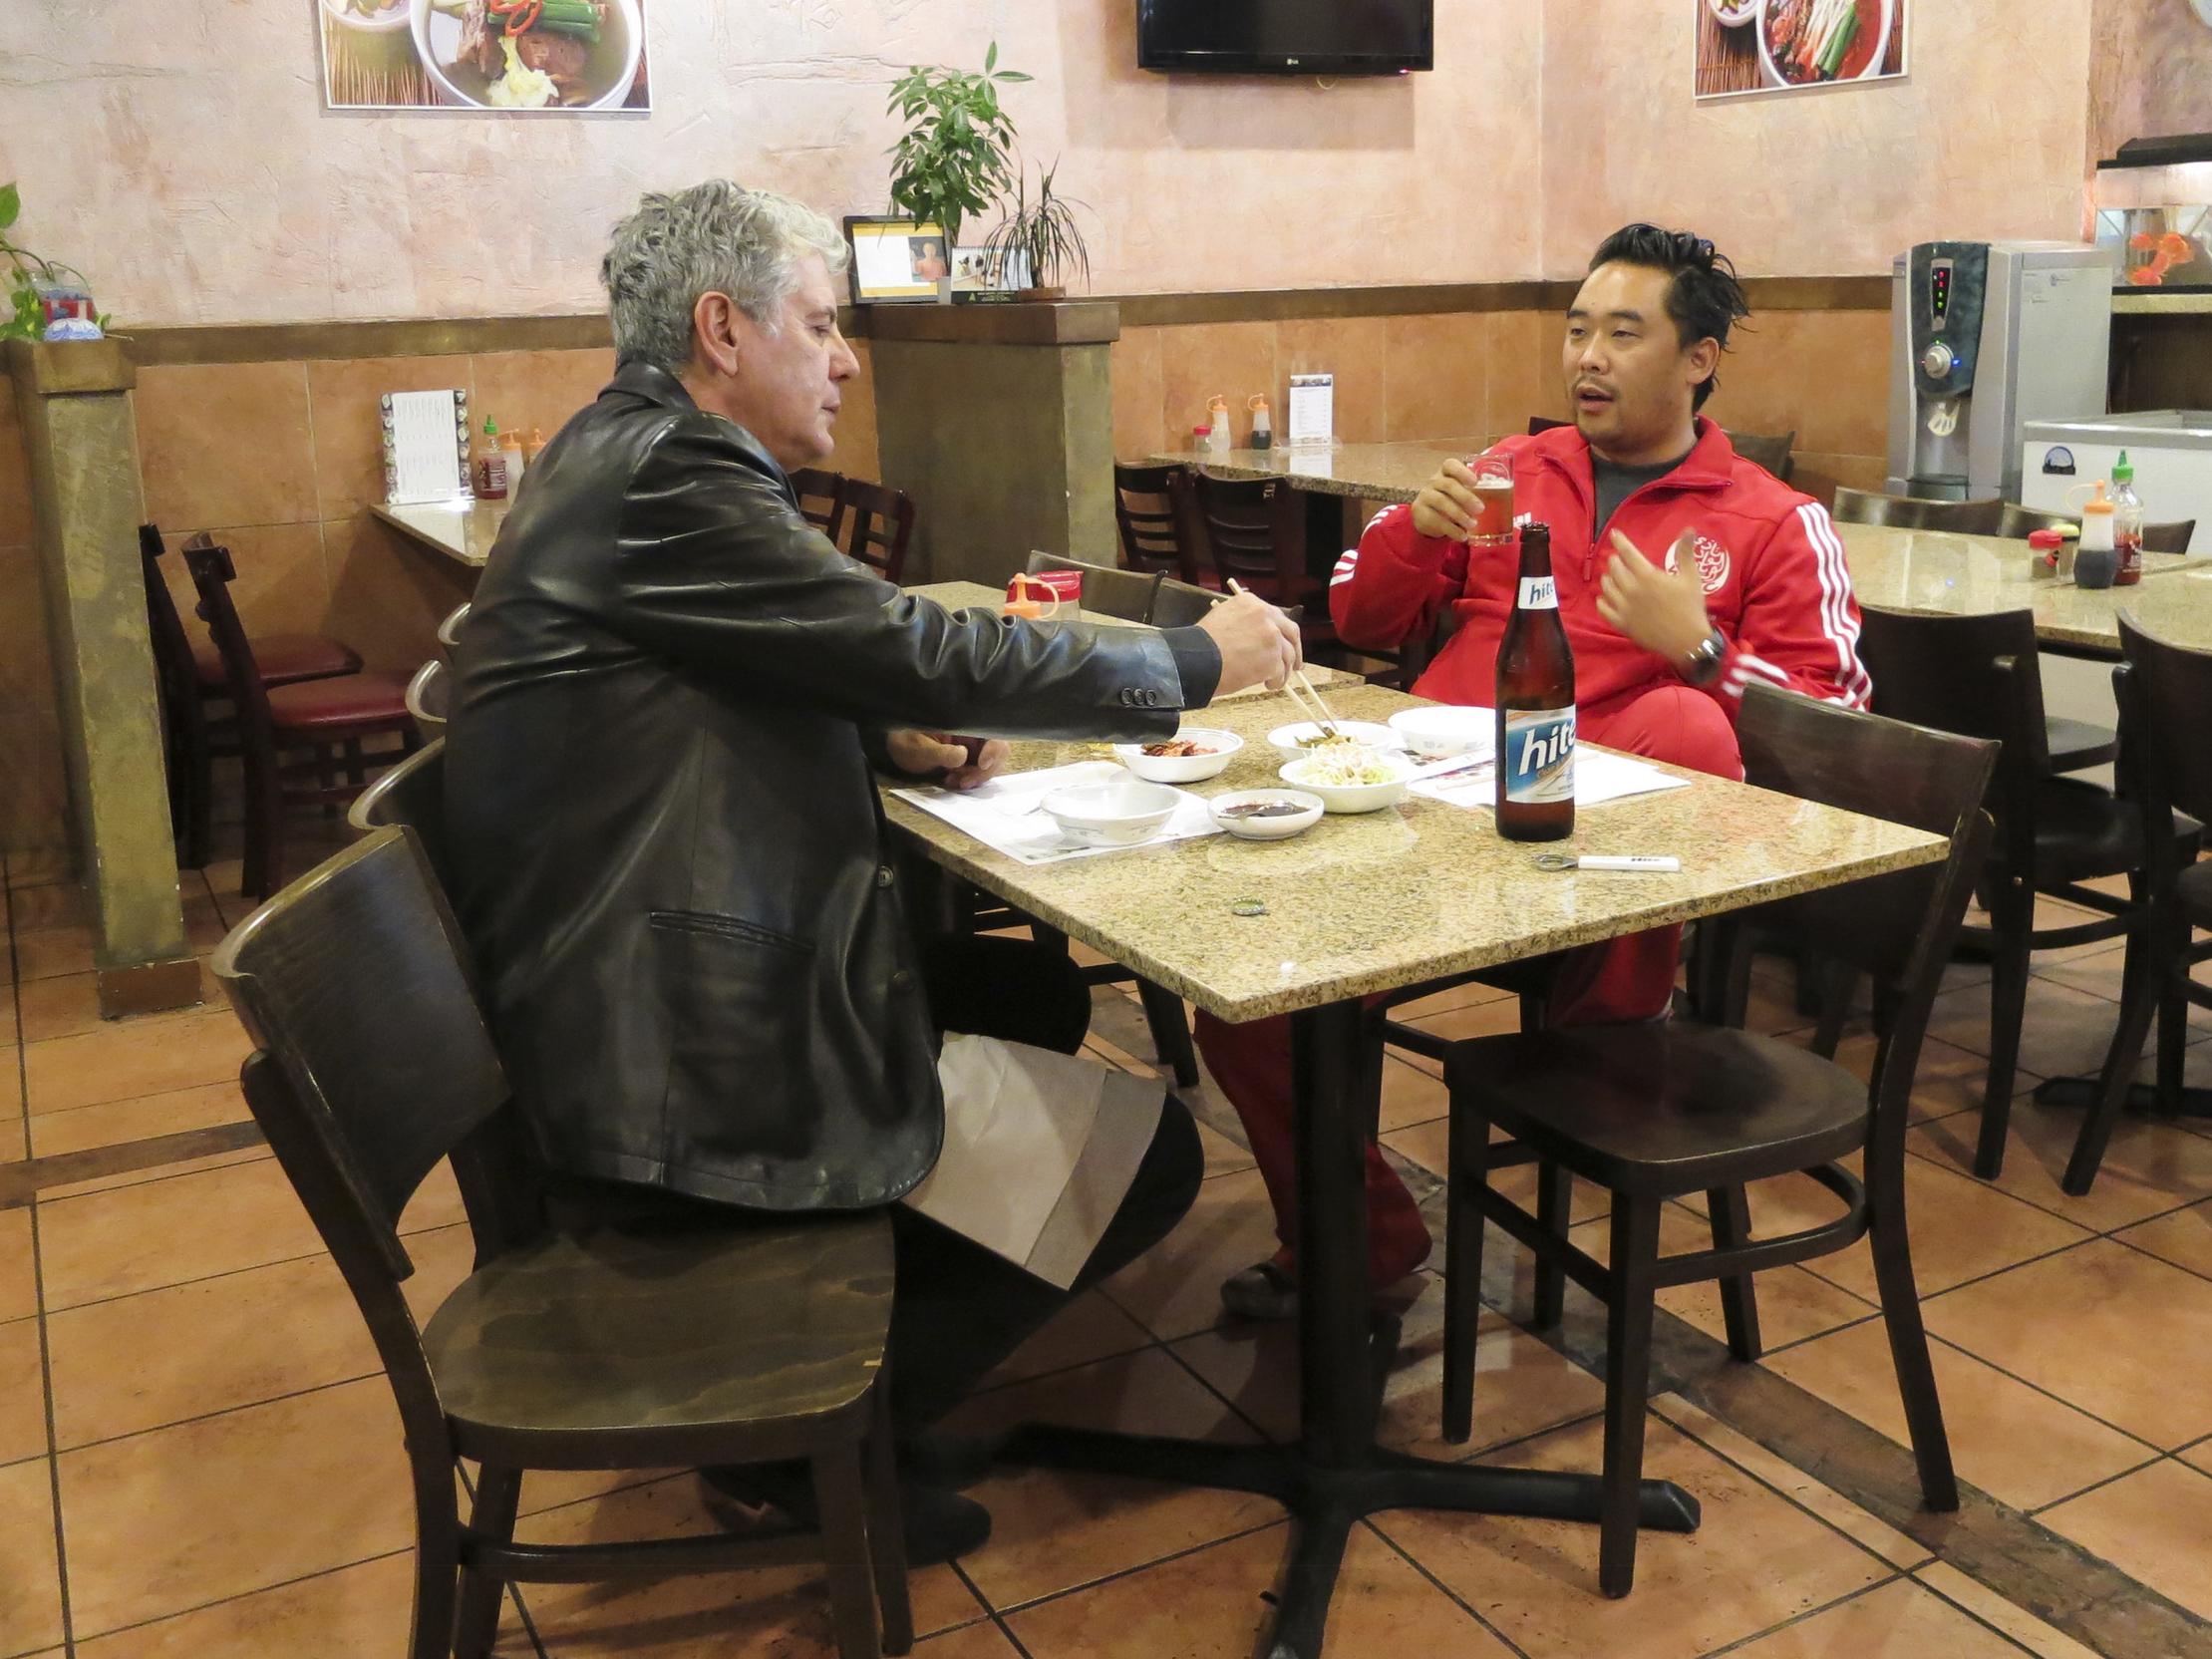 Bourdain eating with David Choe at Myung In Dumplings.